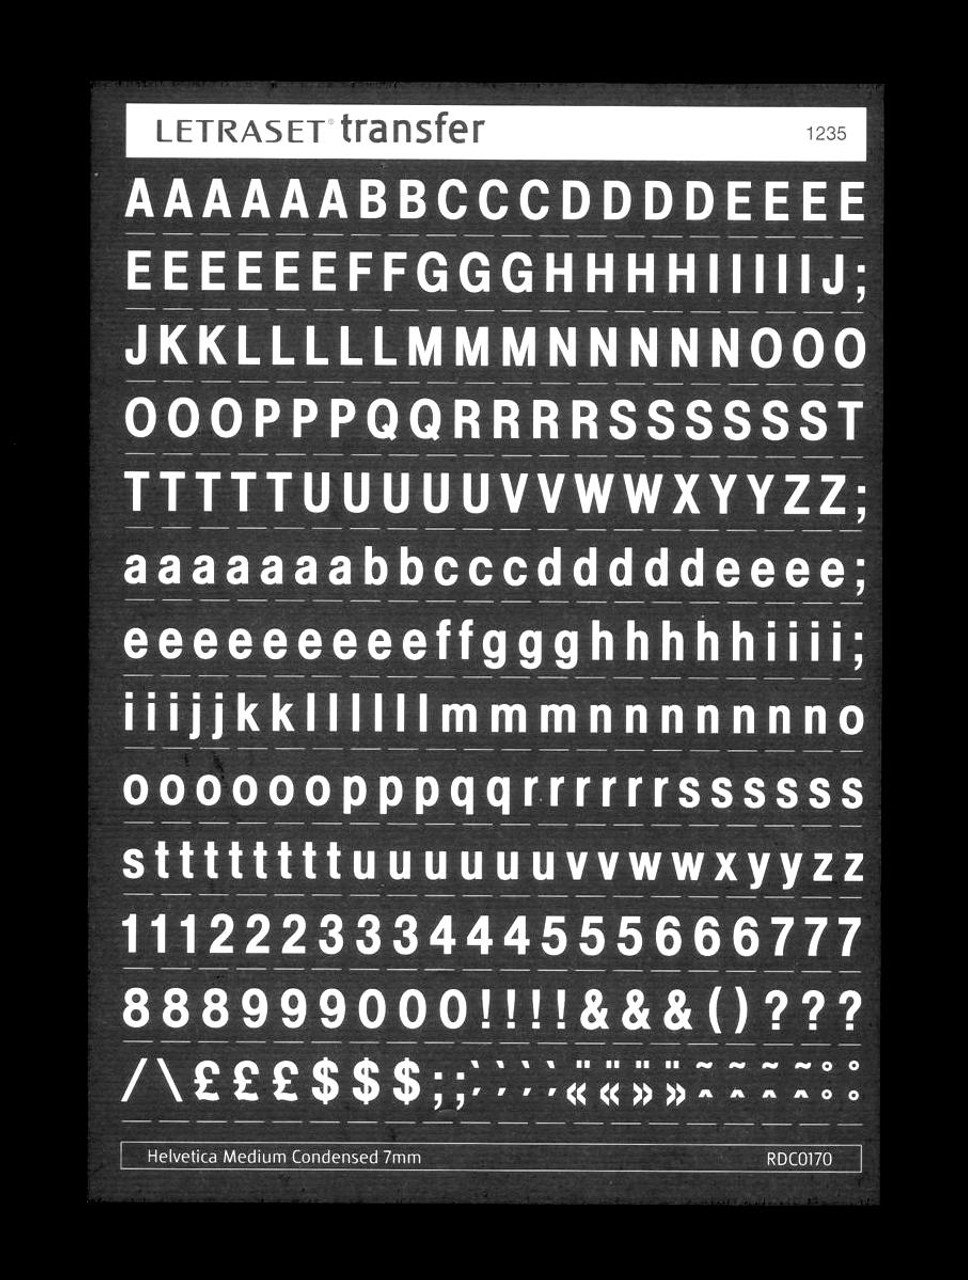 White , Letraset , 7mm , Helvetica Medium Condensed , RDC0170